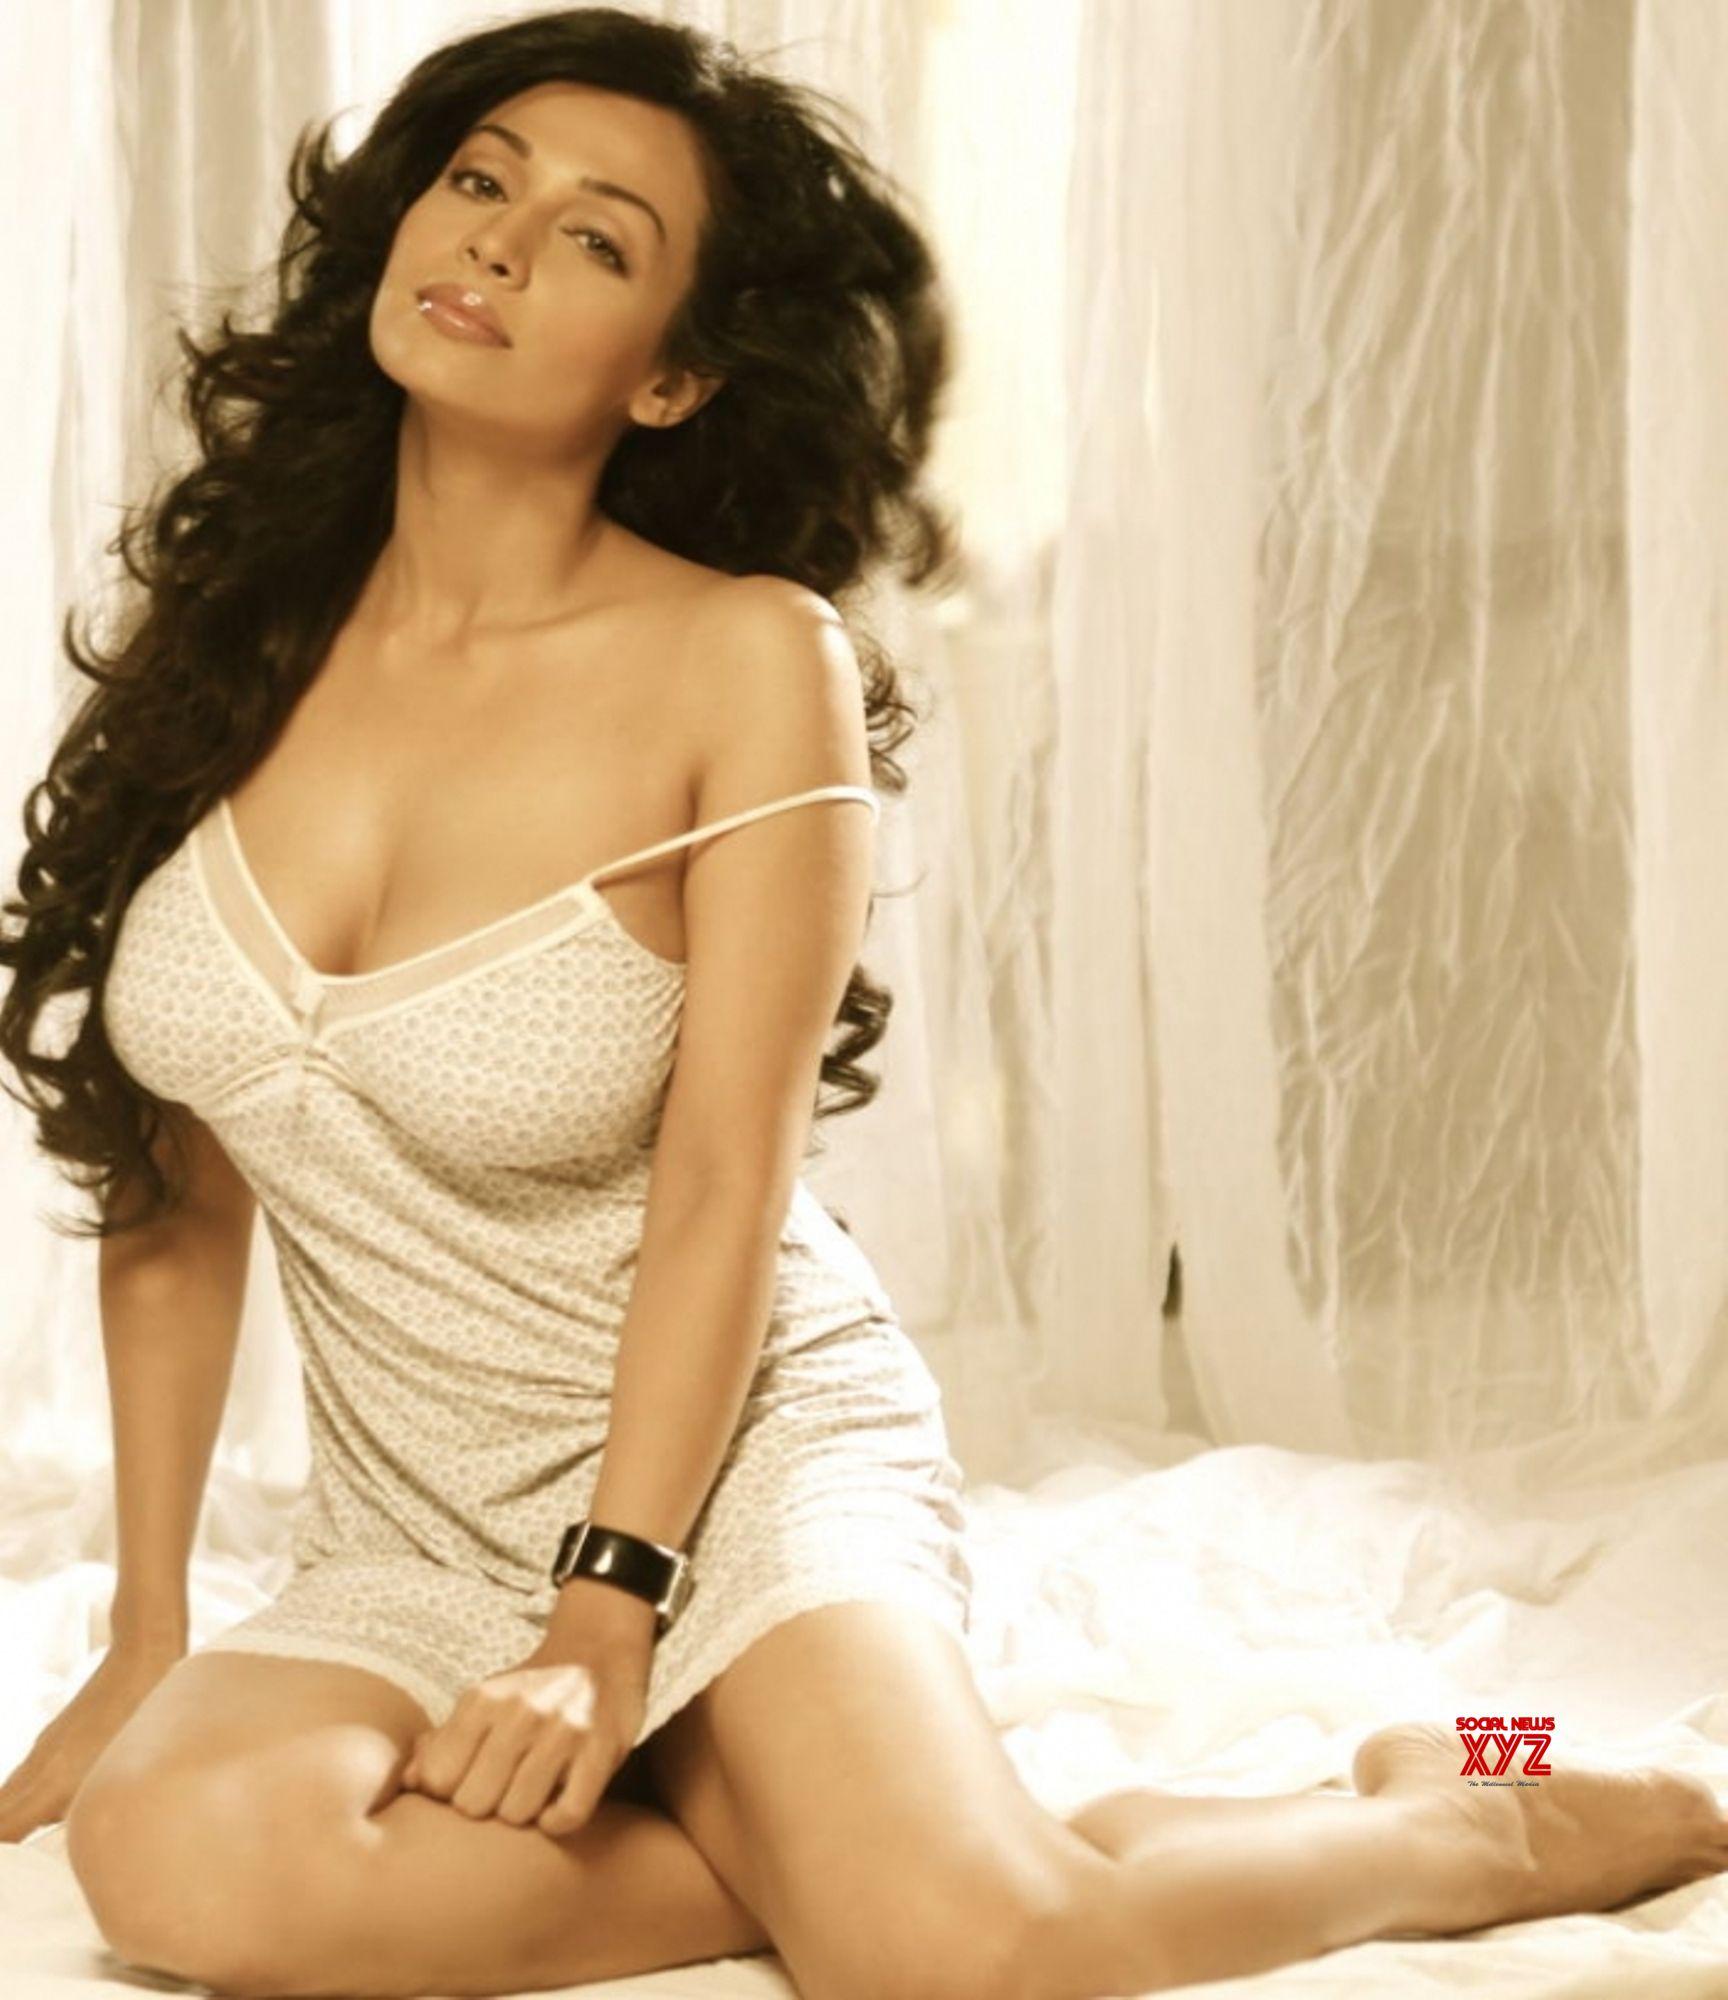 Designing Women Movie Actress Asha Saini Latest Hot Stills Social News Xyz